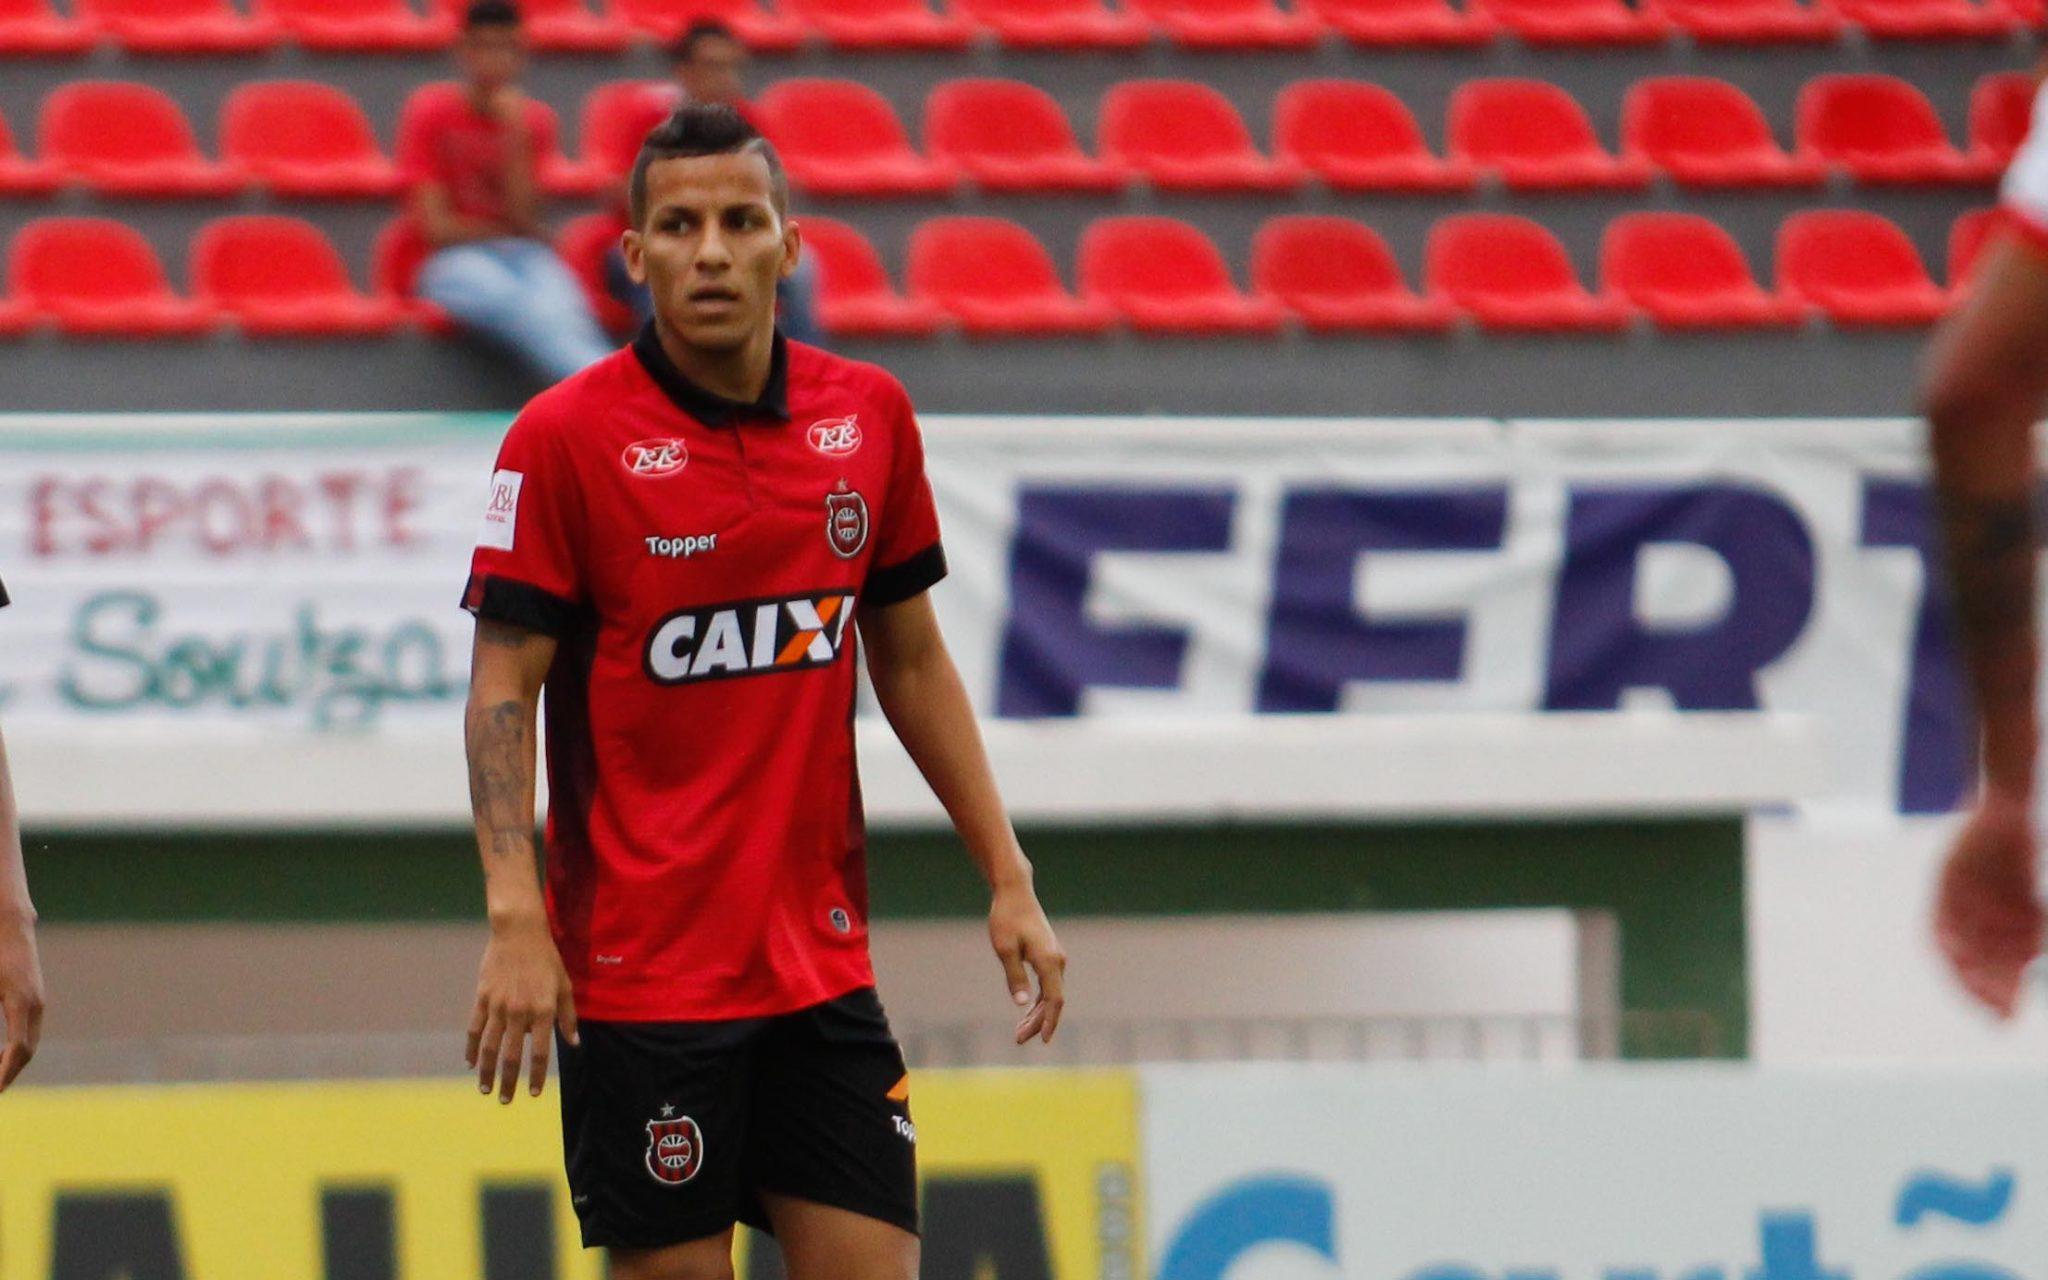 Brasil-Pel: Calyson renova